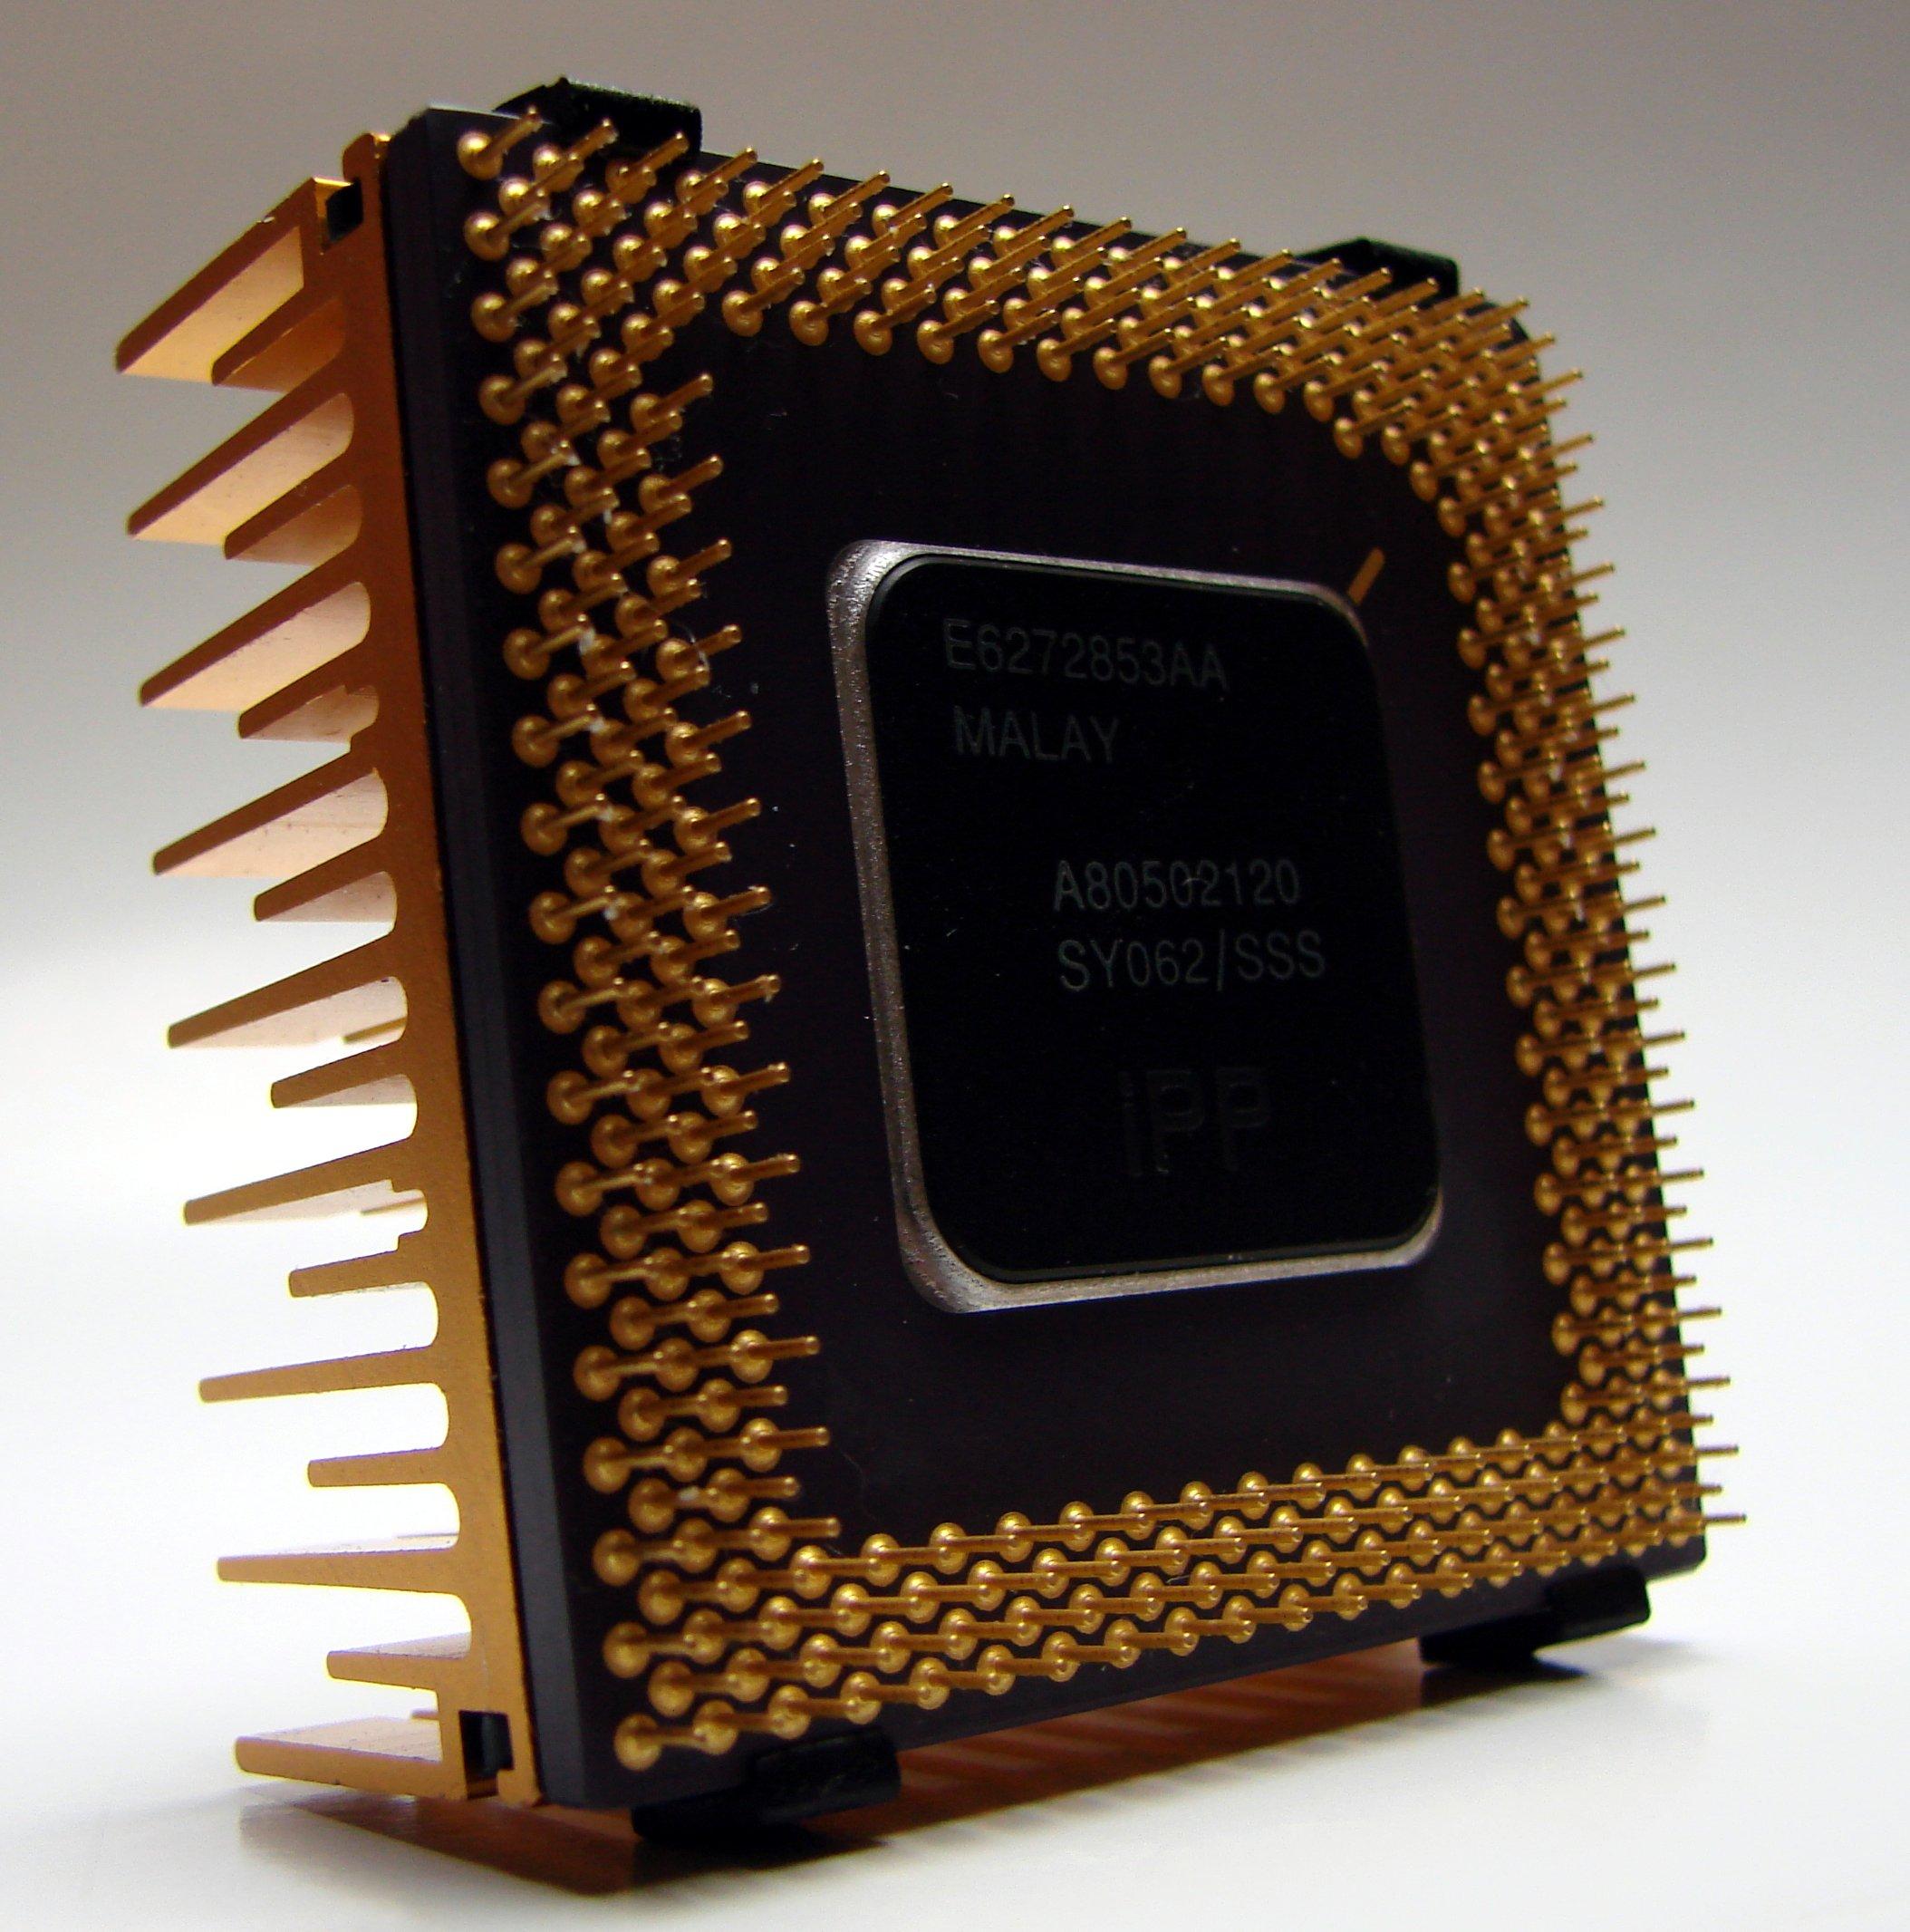 File:Intel Pentium Processor (backside) with heat sink.jpg